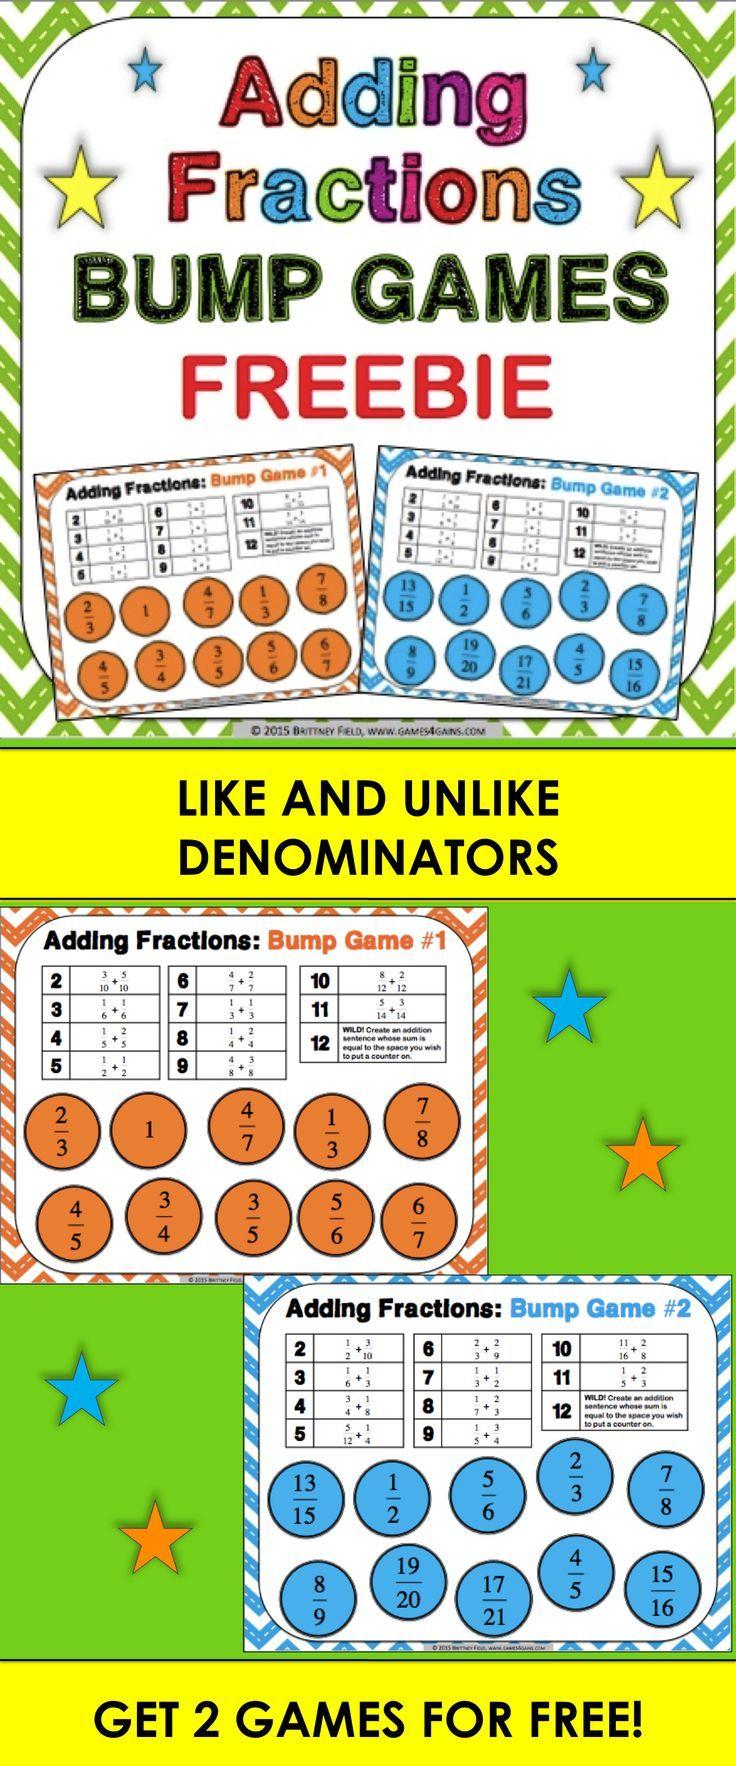 Adding fractions free adding fractions bump games skola